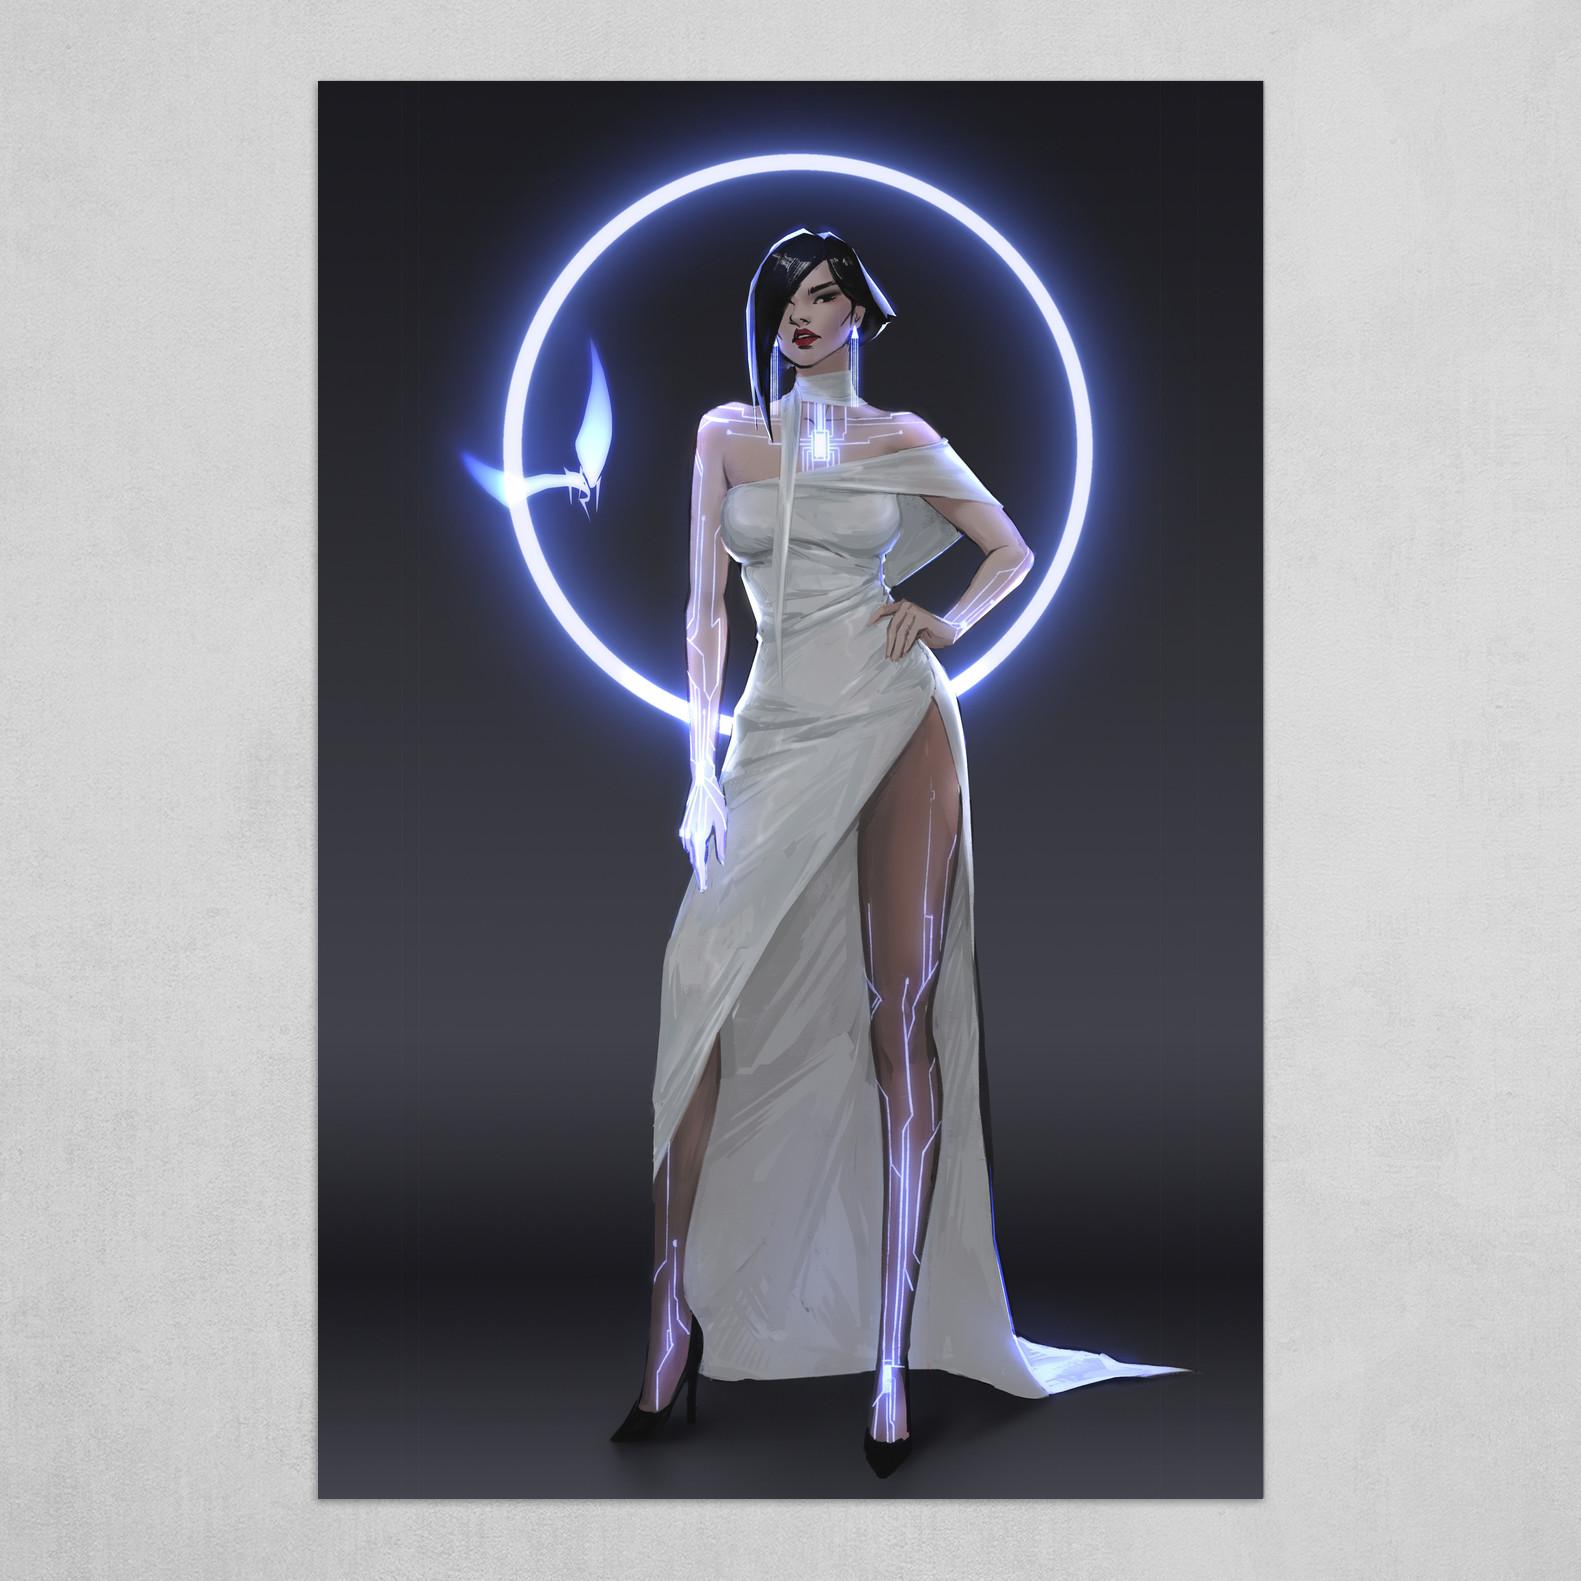 Cyberpunk - Socialite